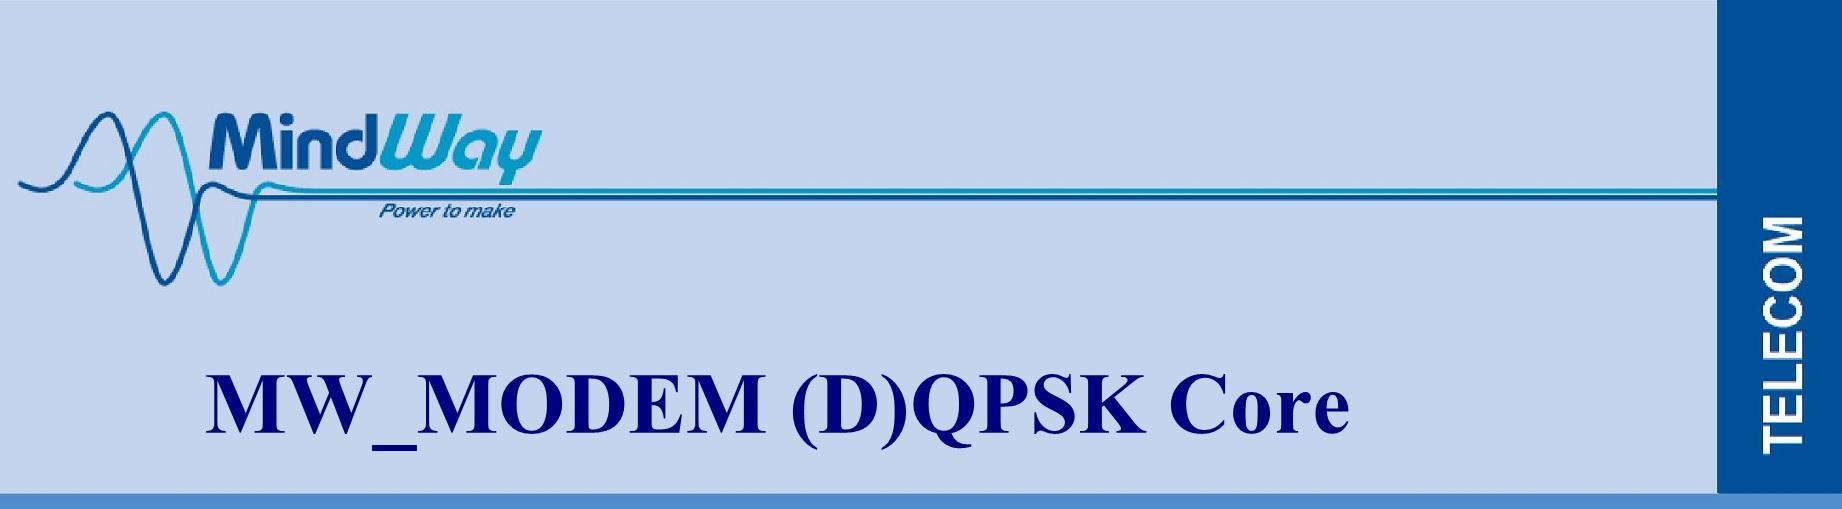 DQPSK_front